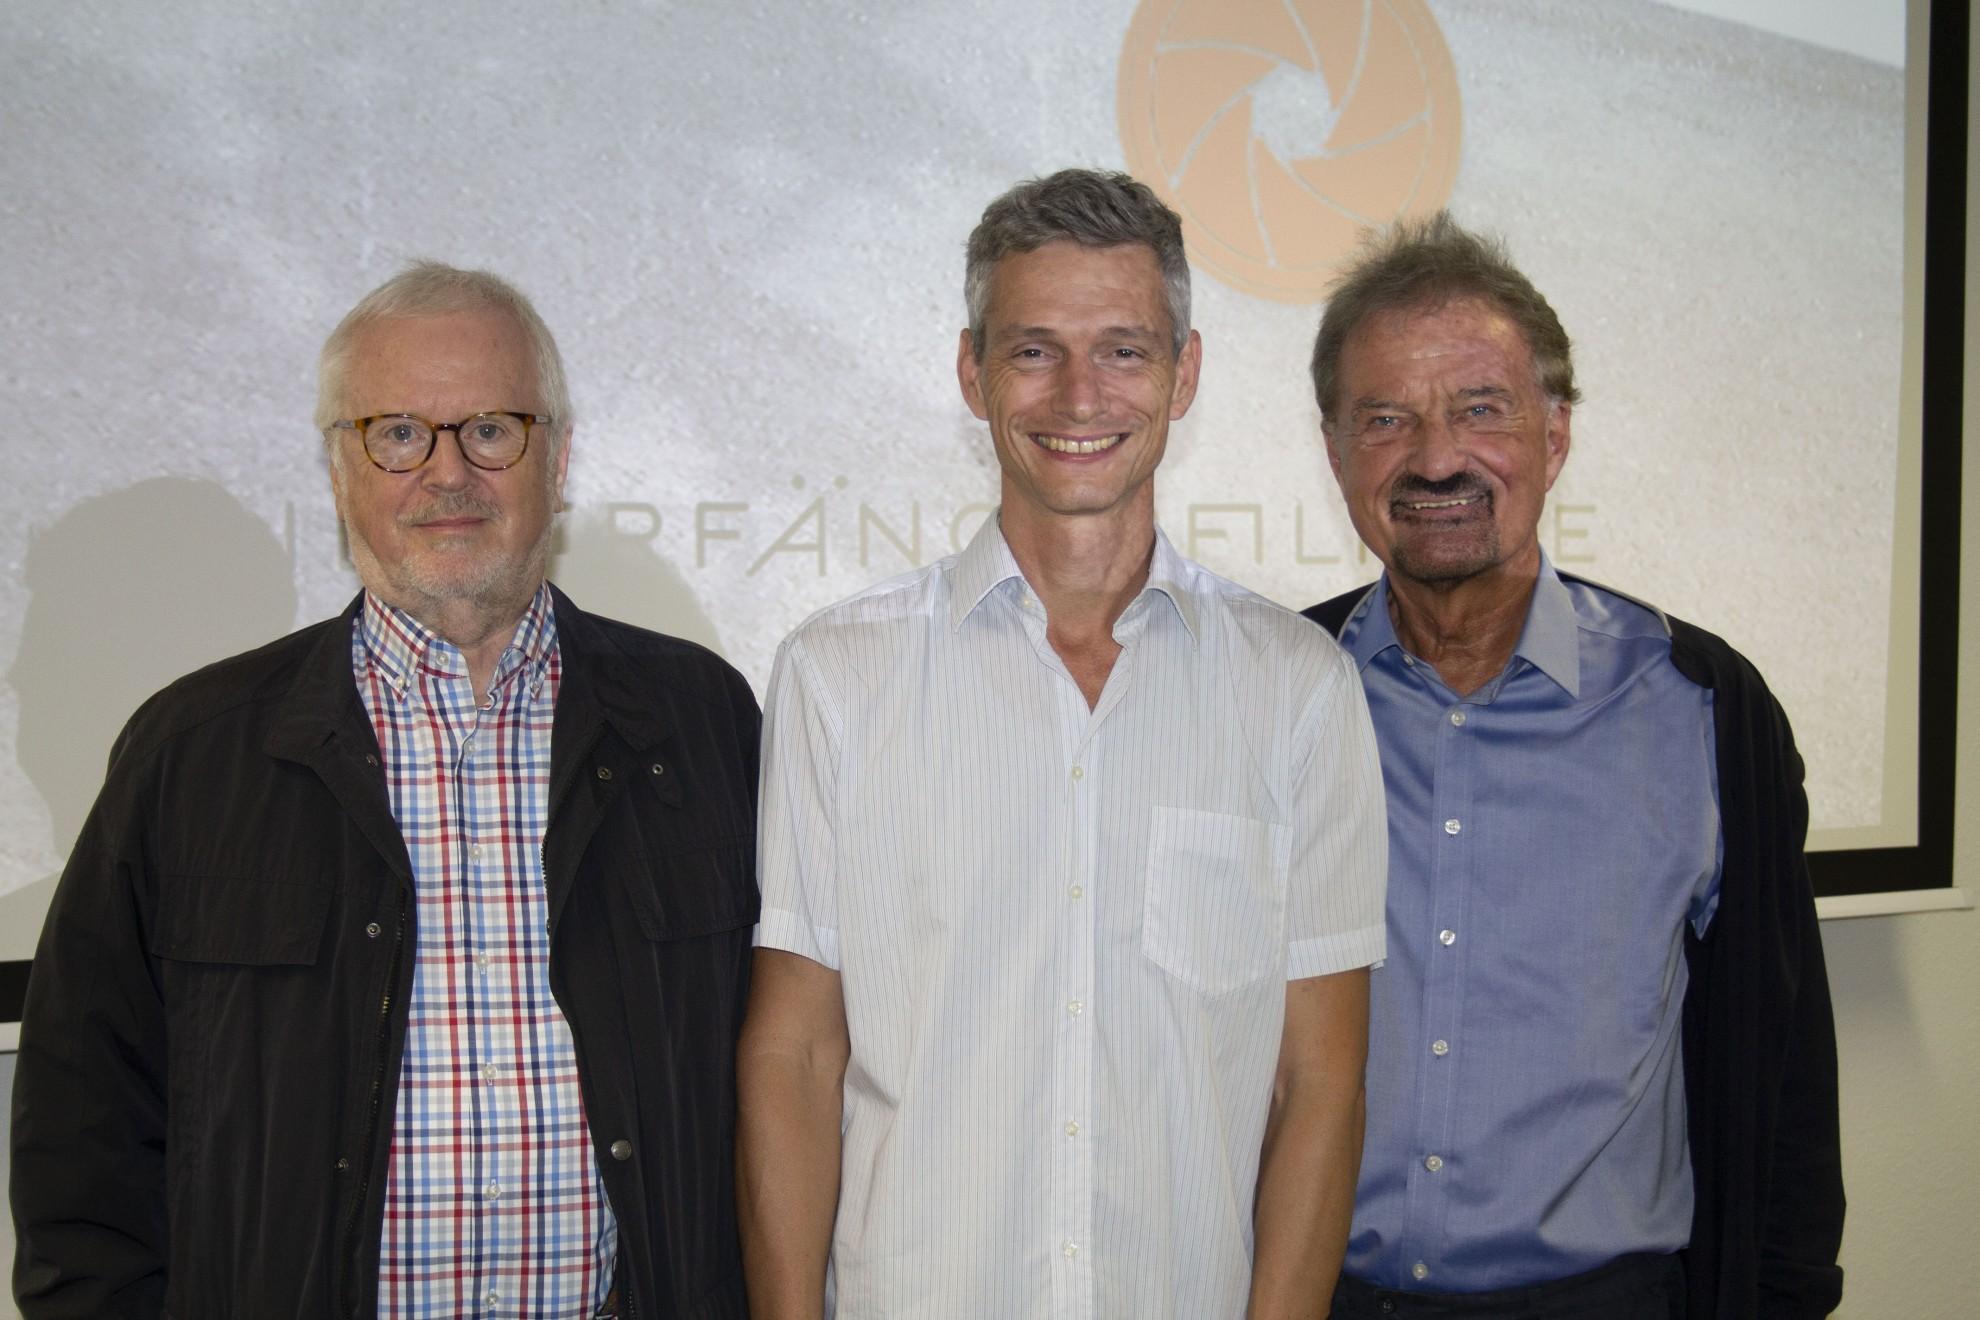 Foto: v.l. Hans-Werner Reichenbach, Tobias Kriele, Karl Finke